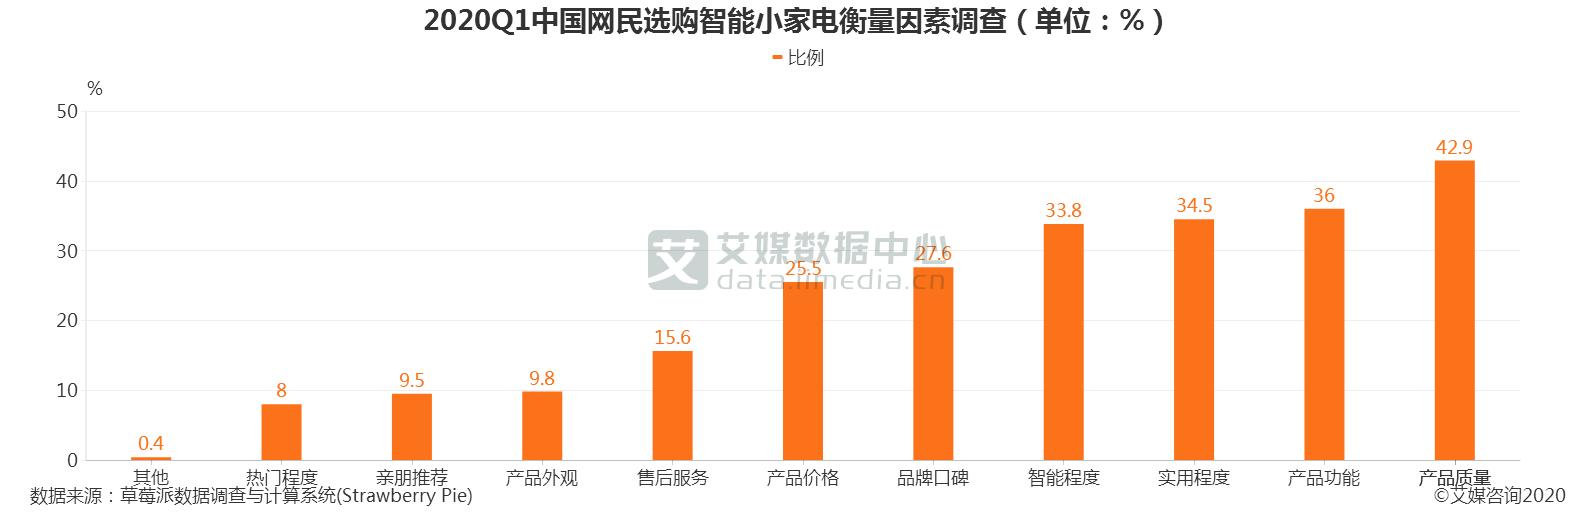 2020Q1中国网民选购智能小家电衡量因素调查